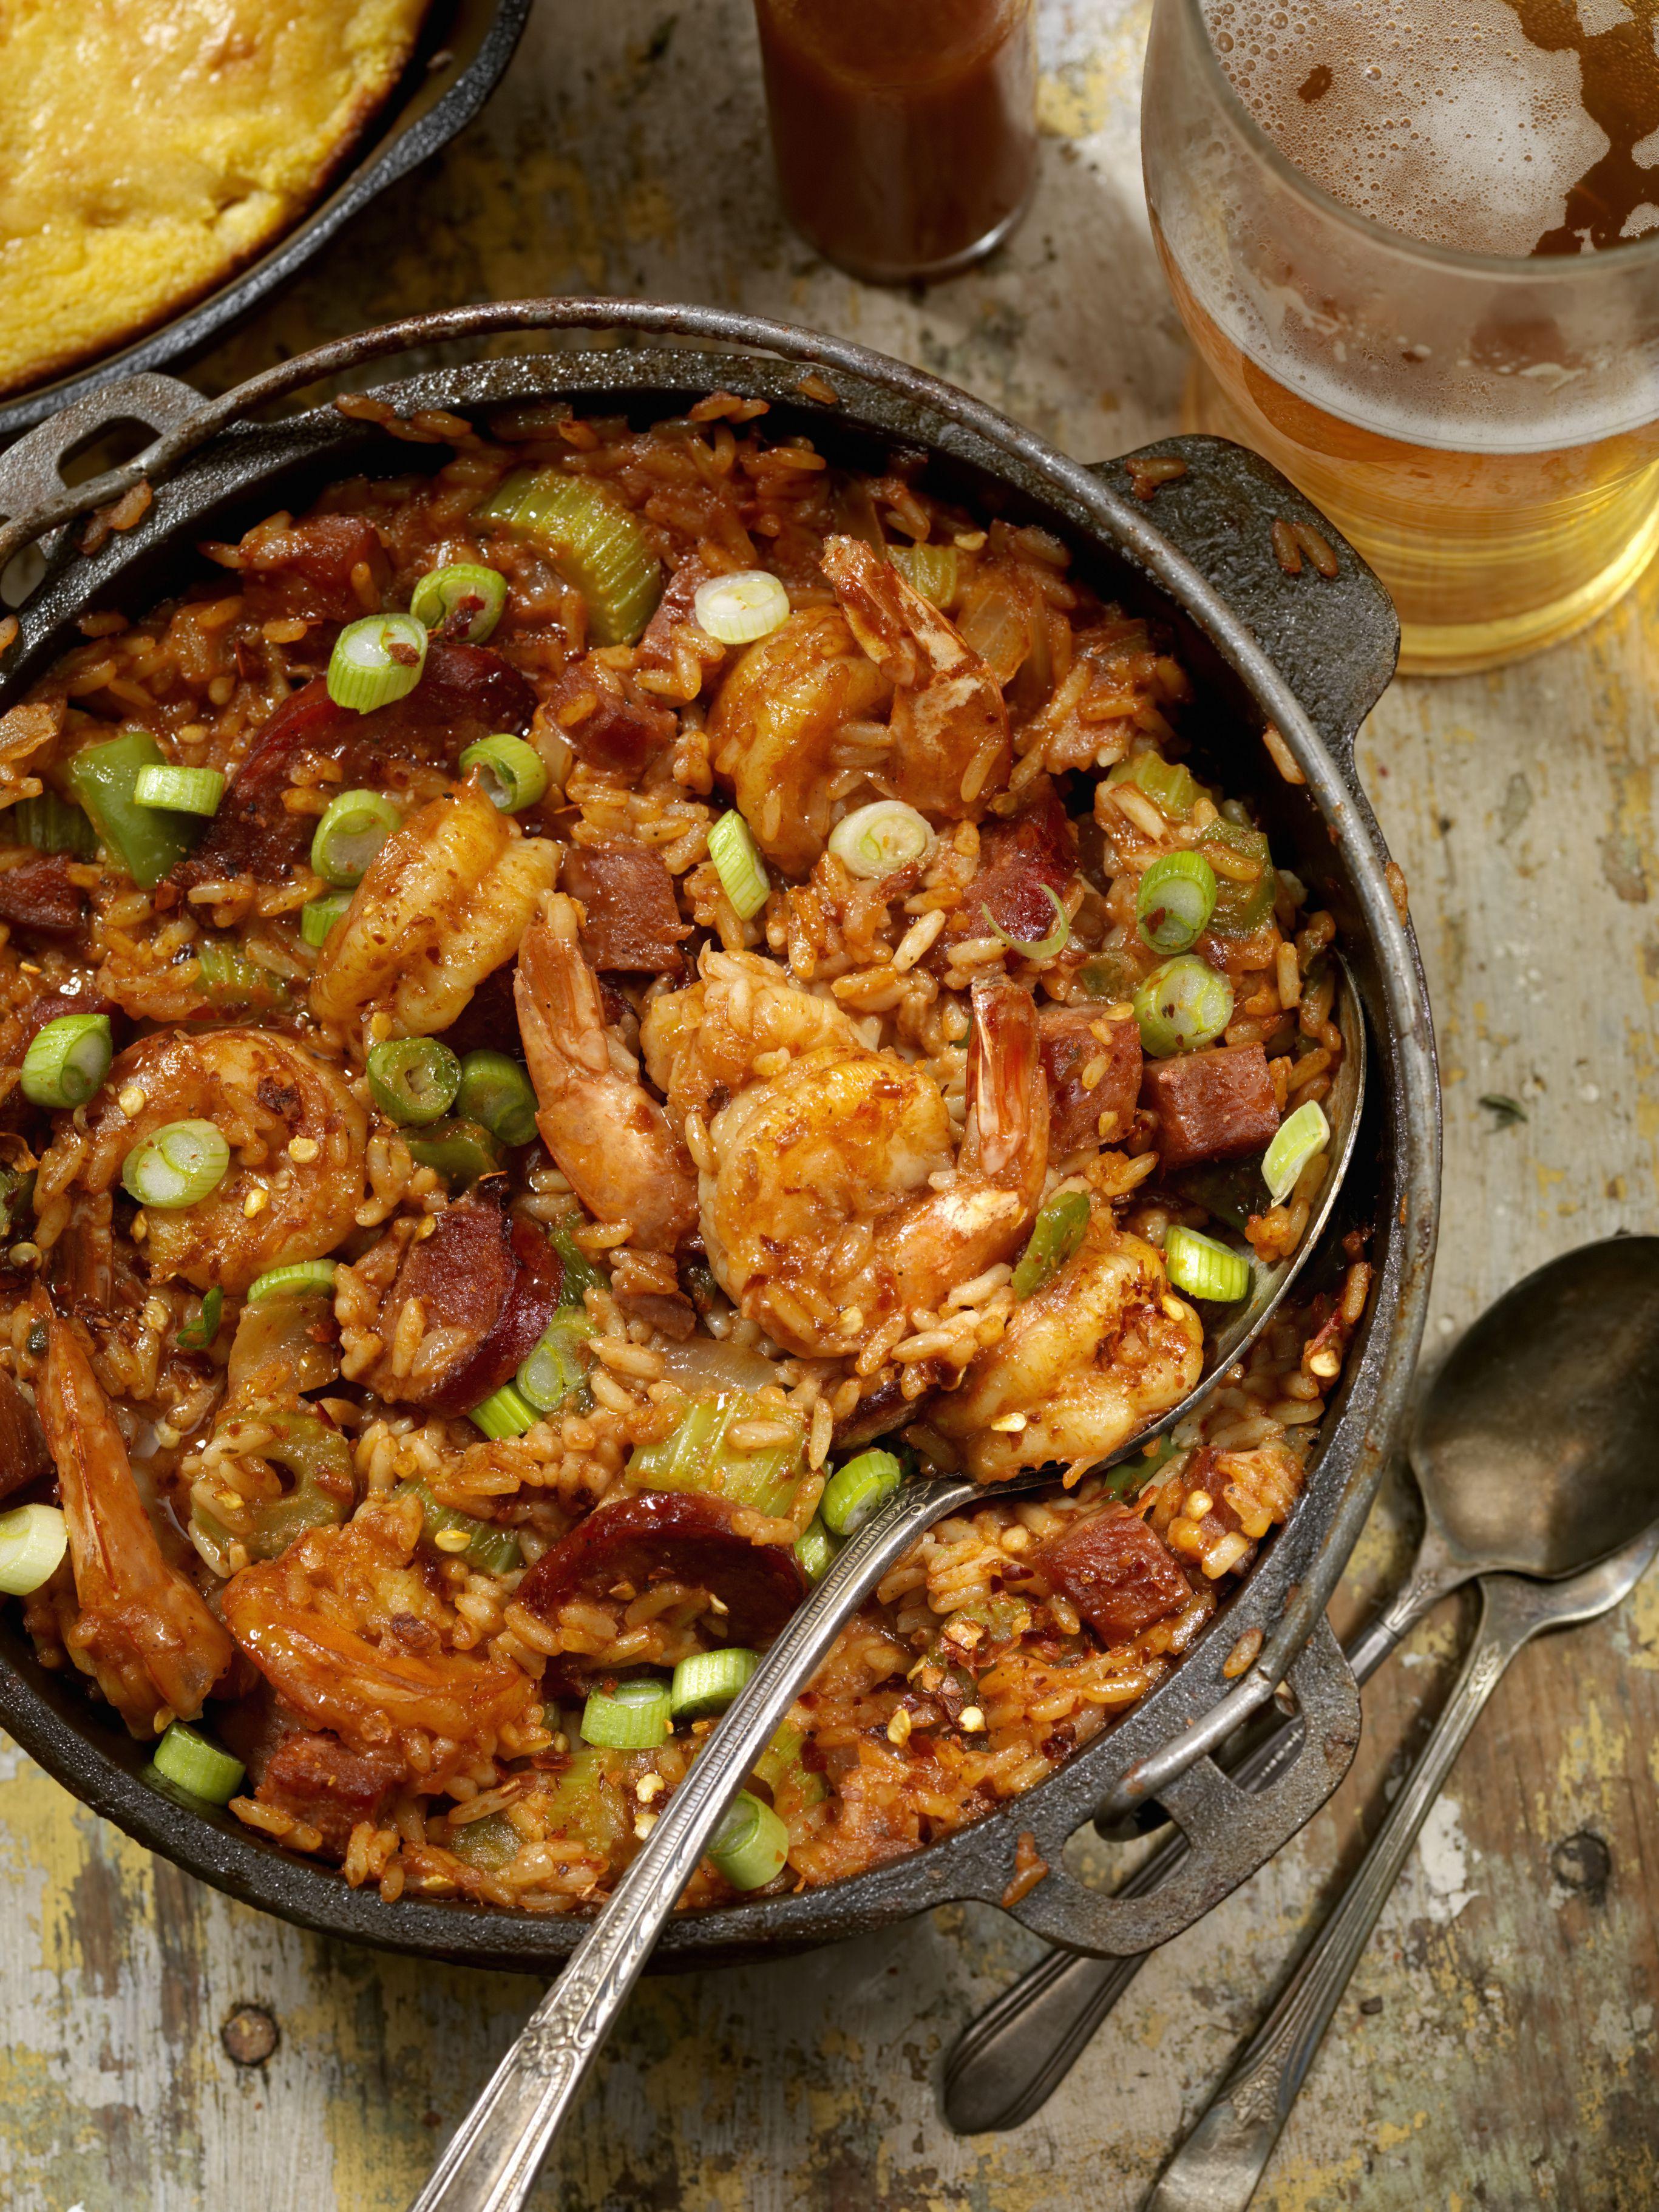 Emeril's Recipe Creole Seasoning